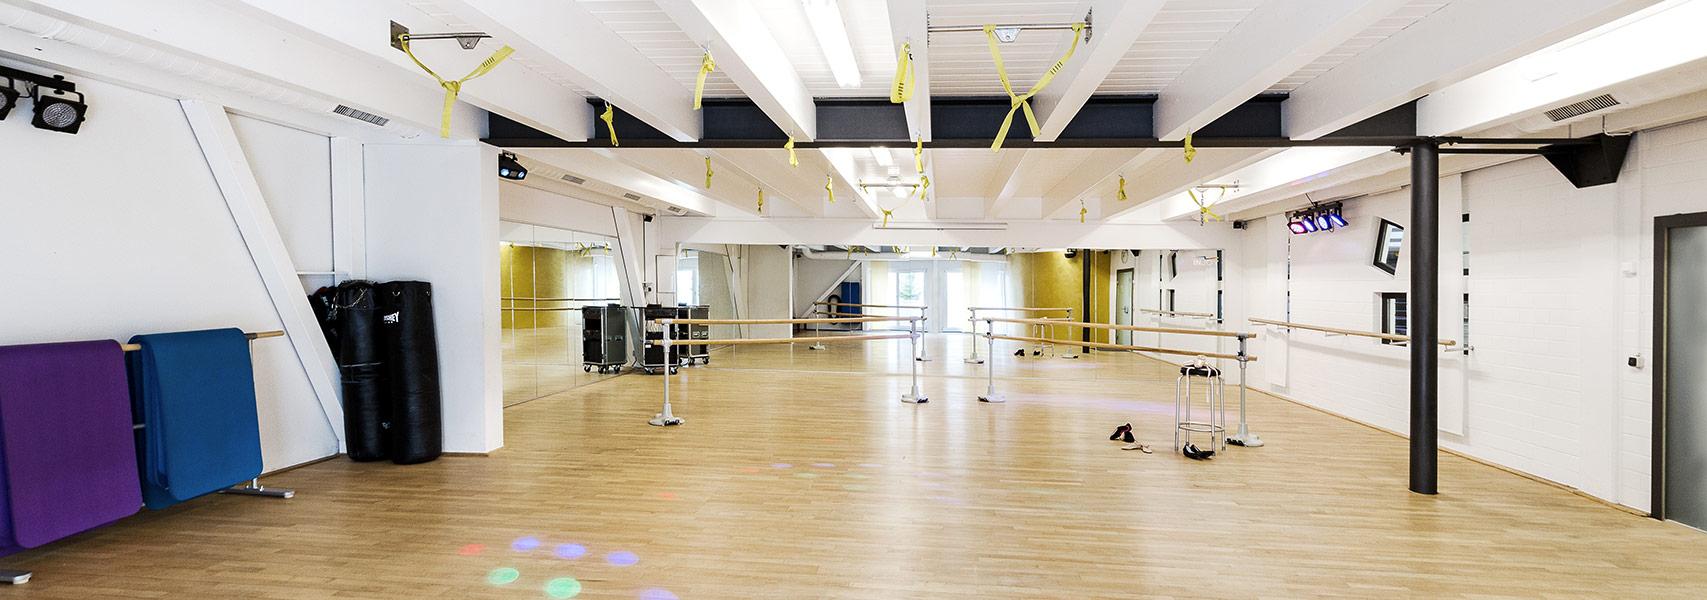 Tanzstudio Kathrin Goebels